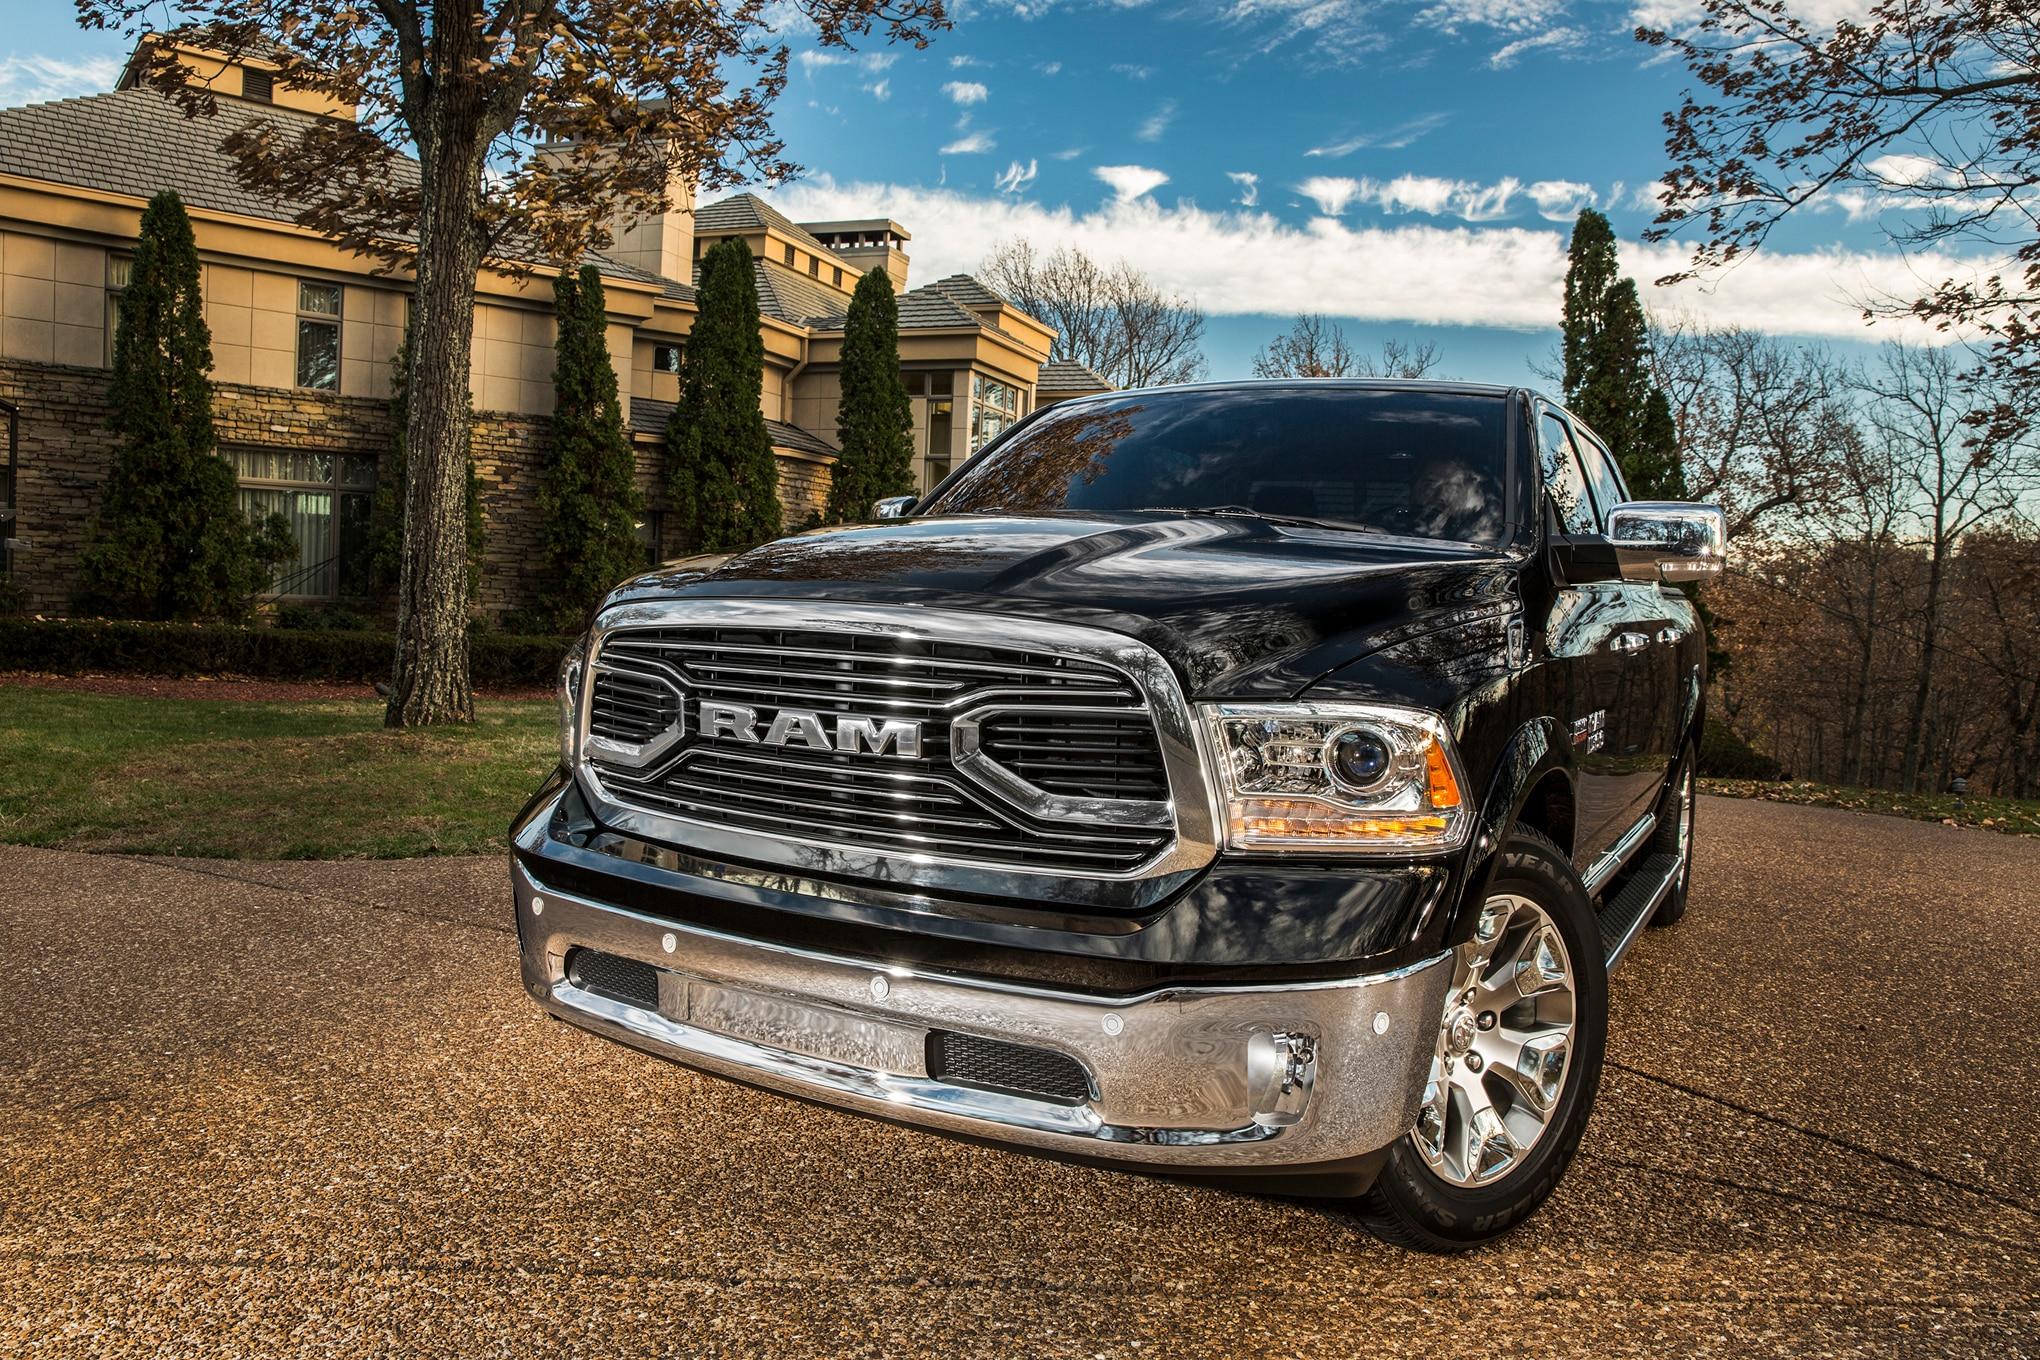 2015 Ram 1500 Laramie Limited Trim Updated